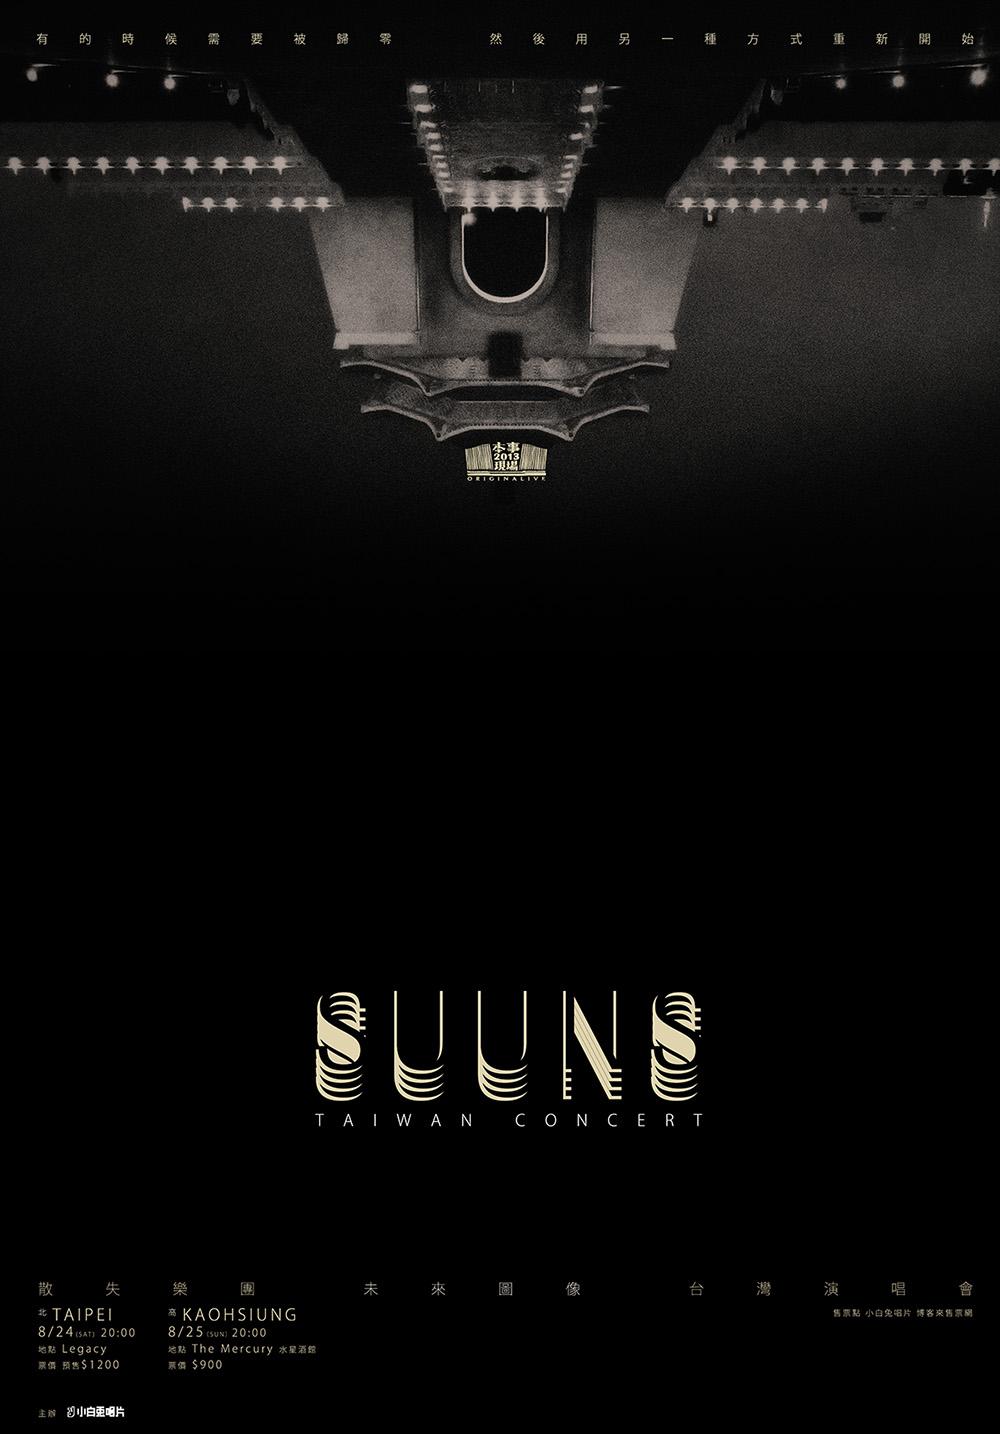 SUUNS-POSTER-01.jpg